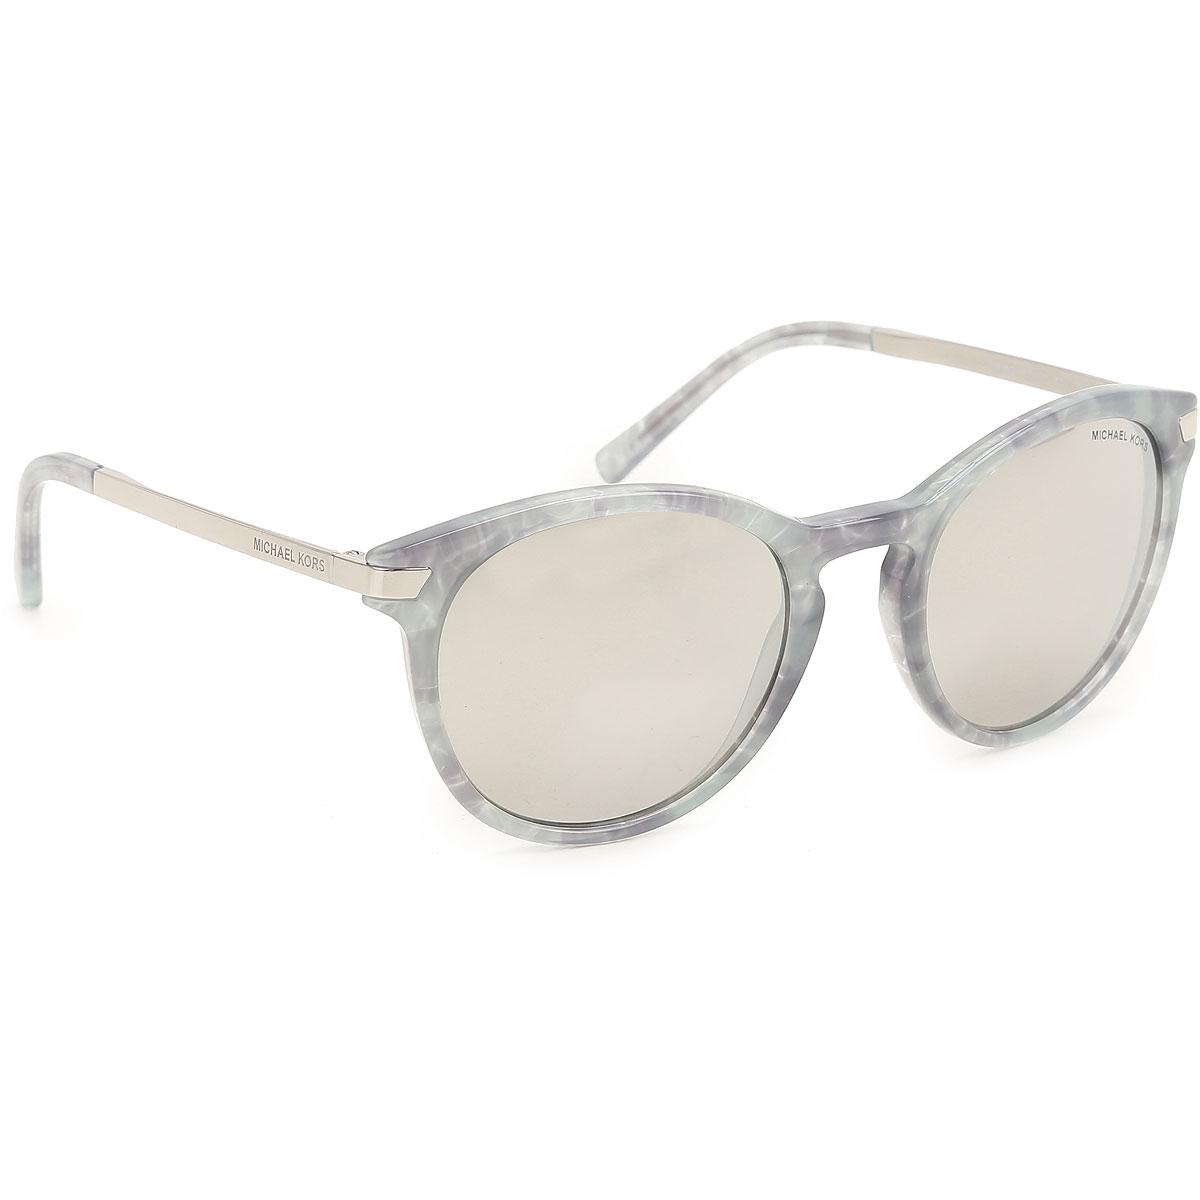 Michael Kors Sunglasses On Sale, Striped Grey, 2017